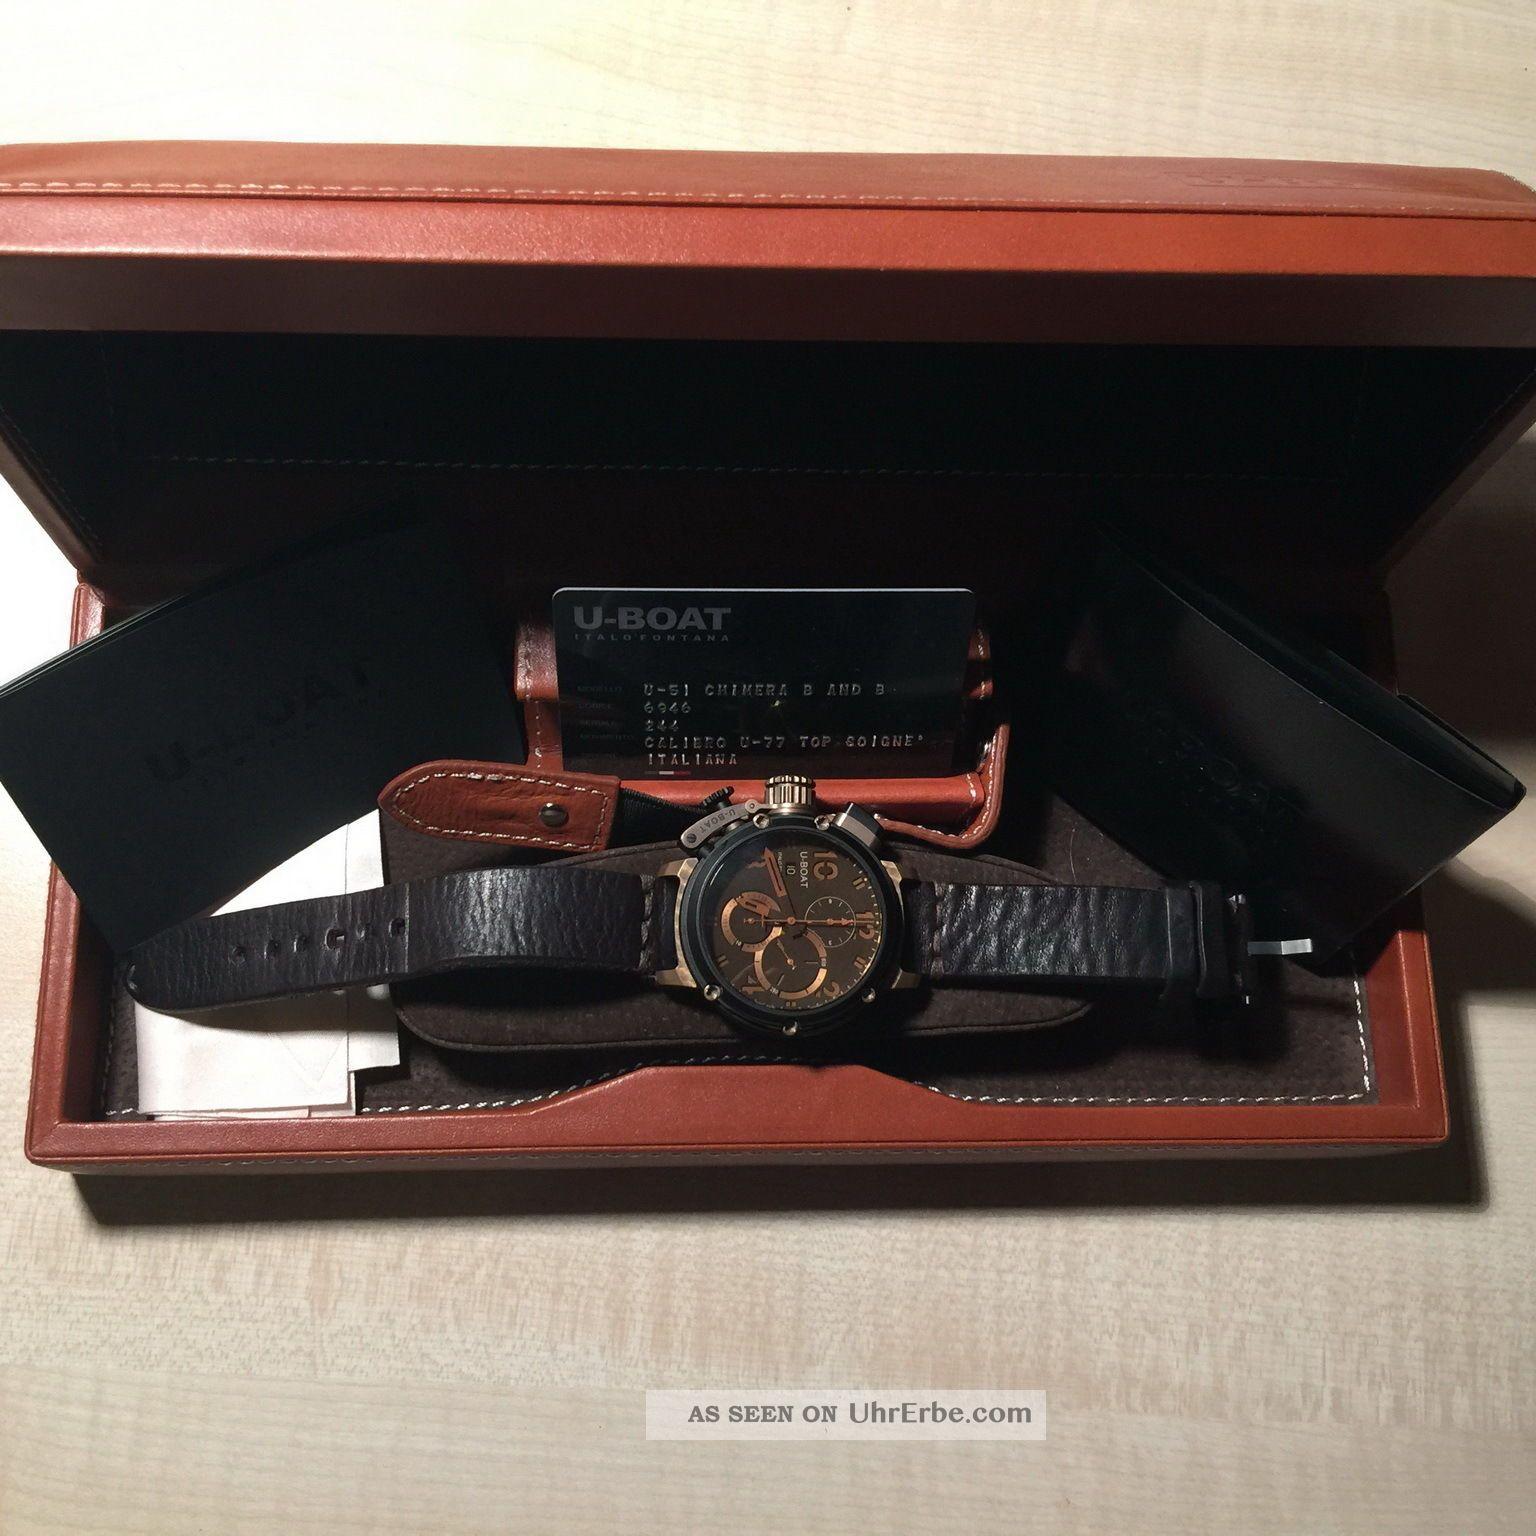 Neuwertige U Boat Chimera U - 51 Limitierter (300) Bronze Chronograph Rg 09/2013 Armbanduhren Bild